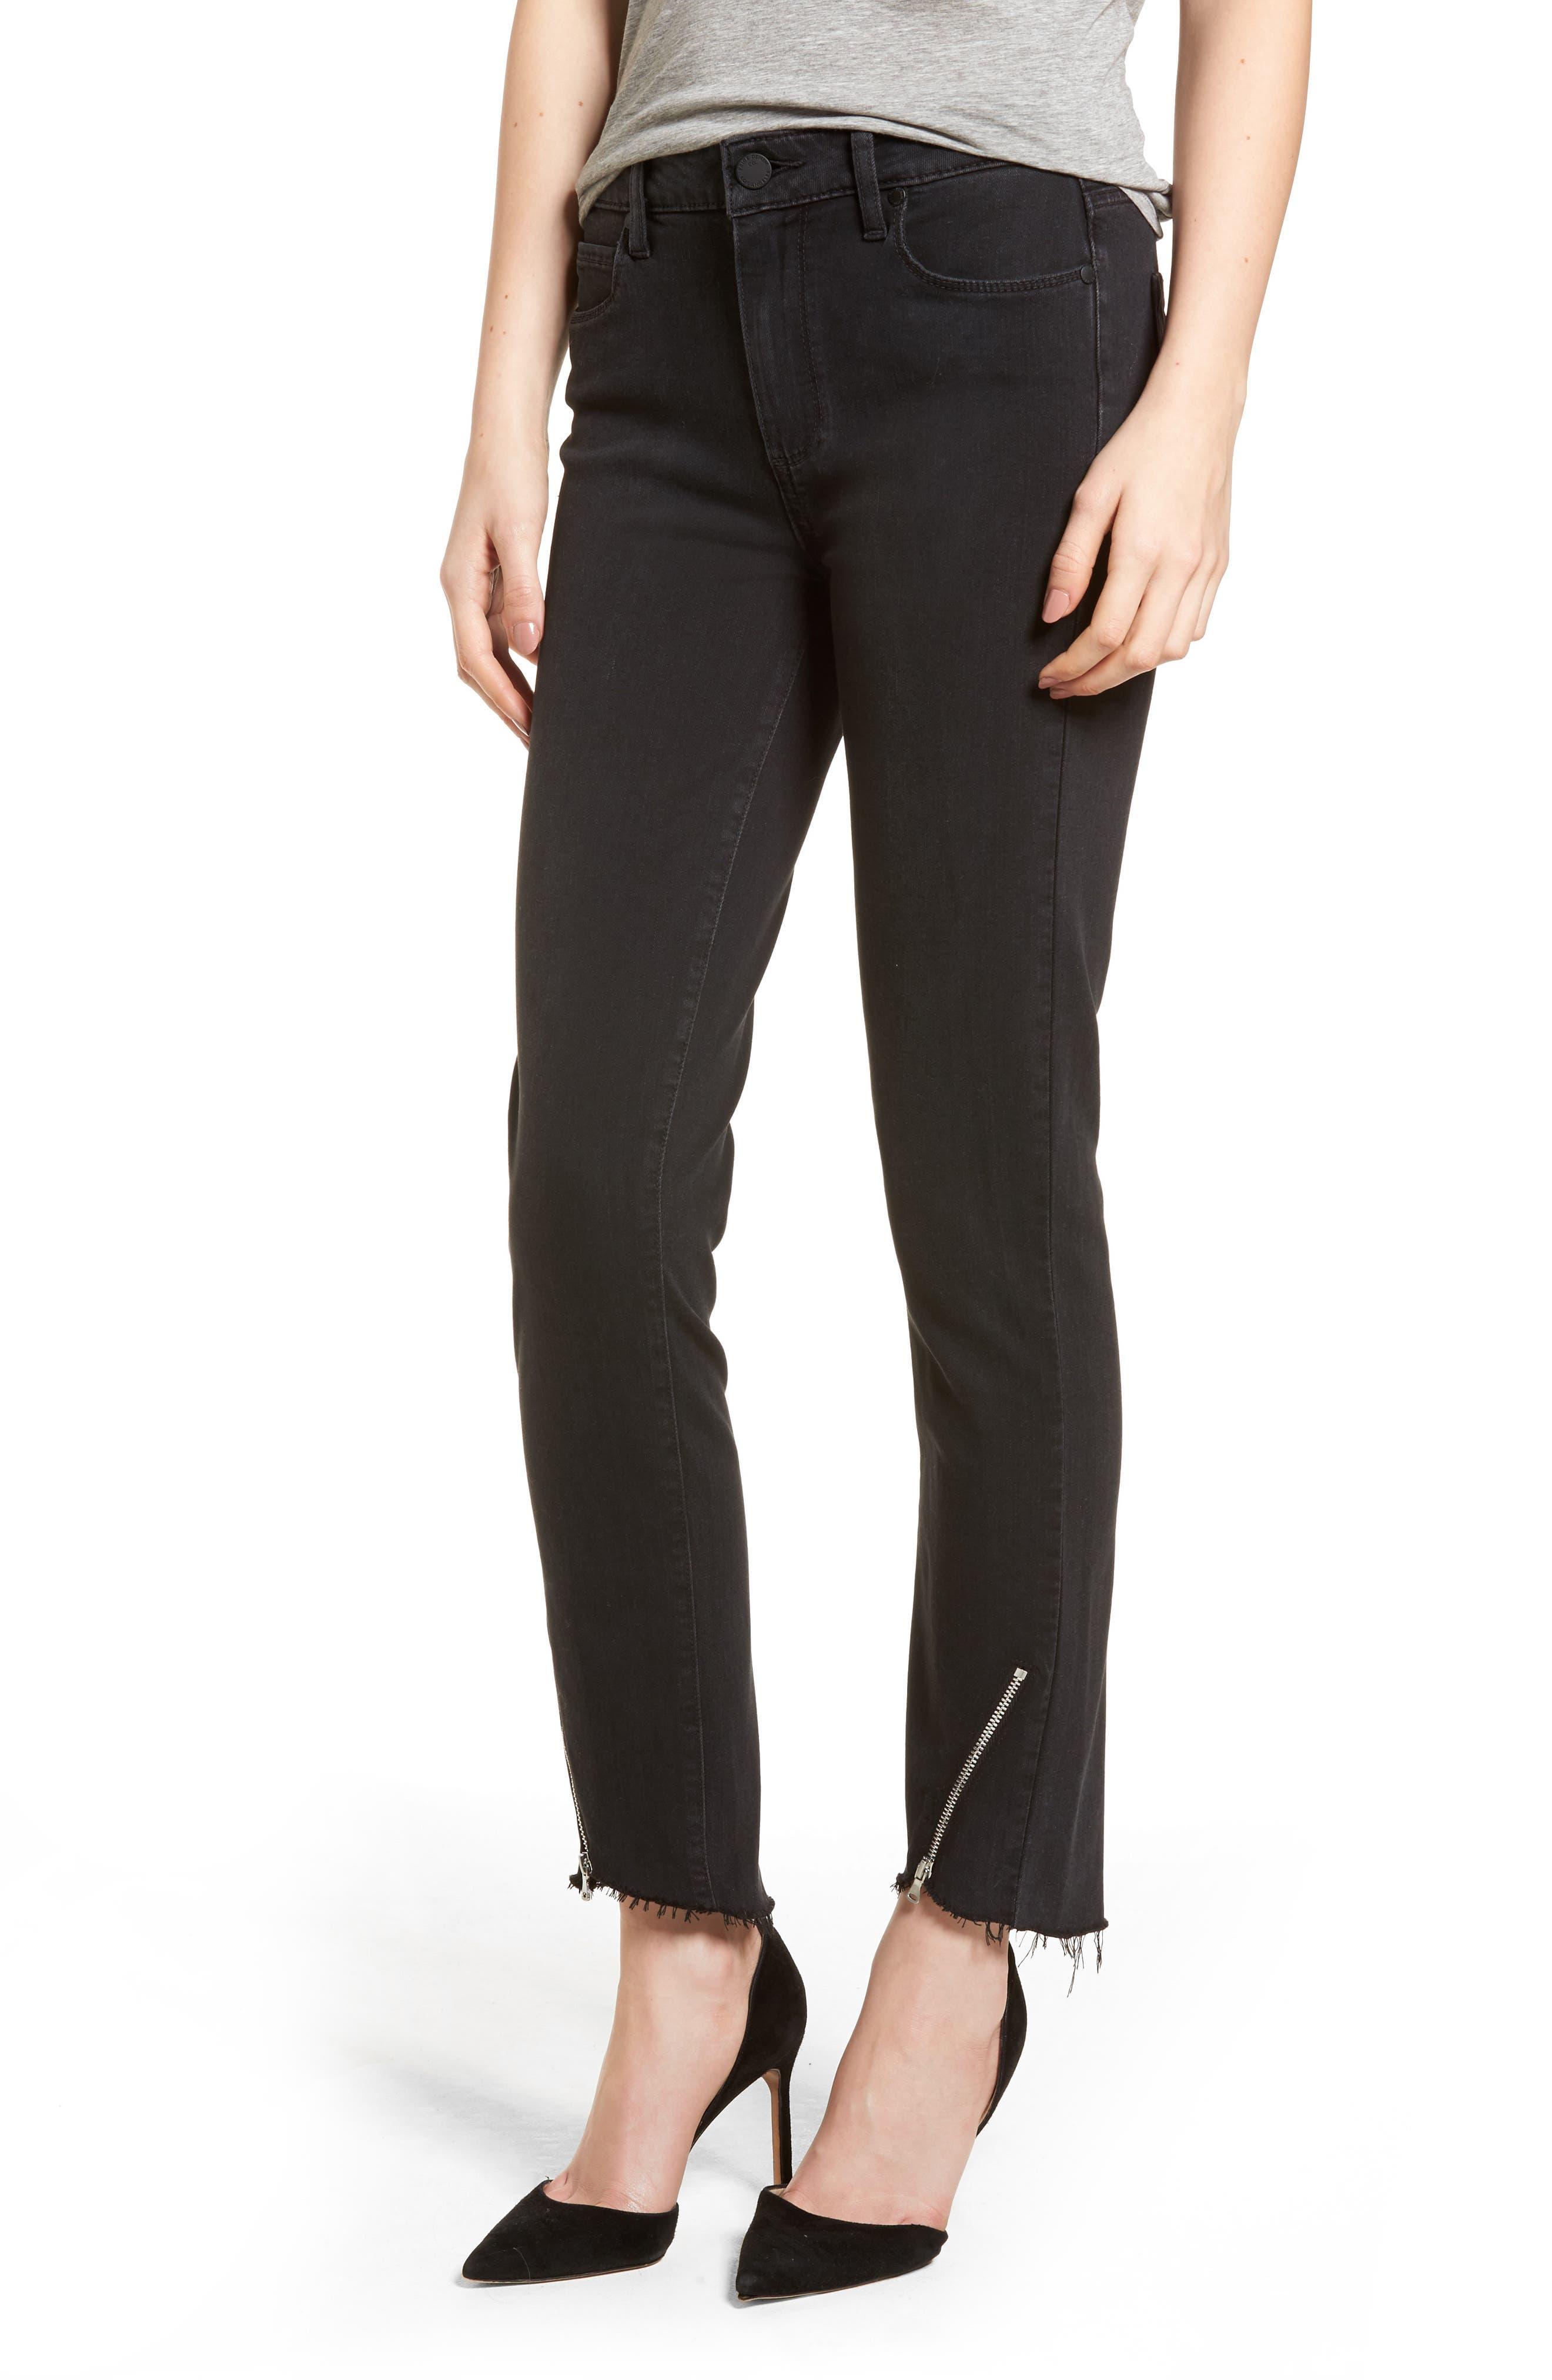 Transcend - Hoxton High Waist Ultra Skinny Jeans,                             Main thumbnail 1, color,                             Black Fog